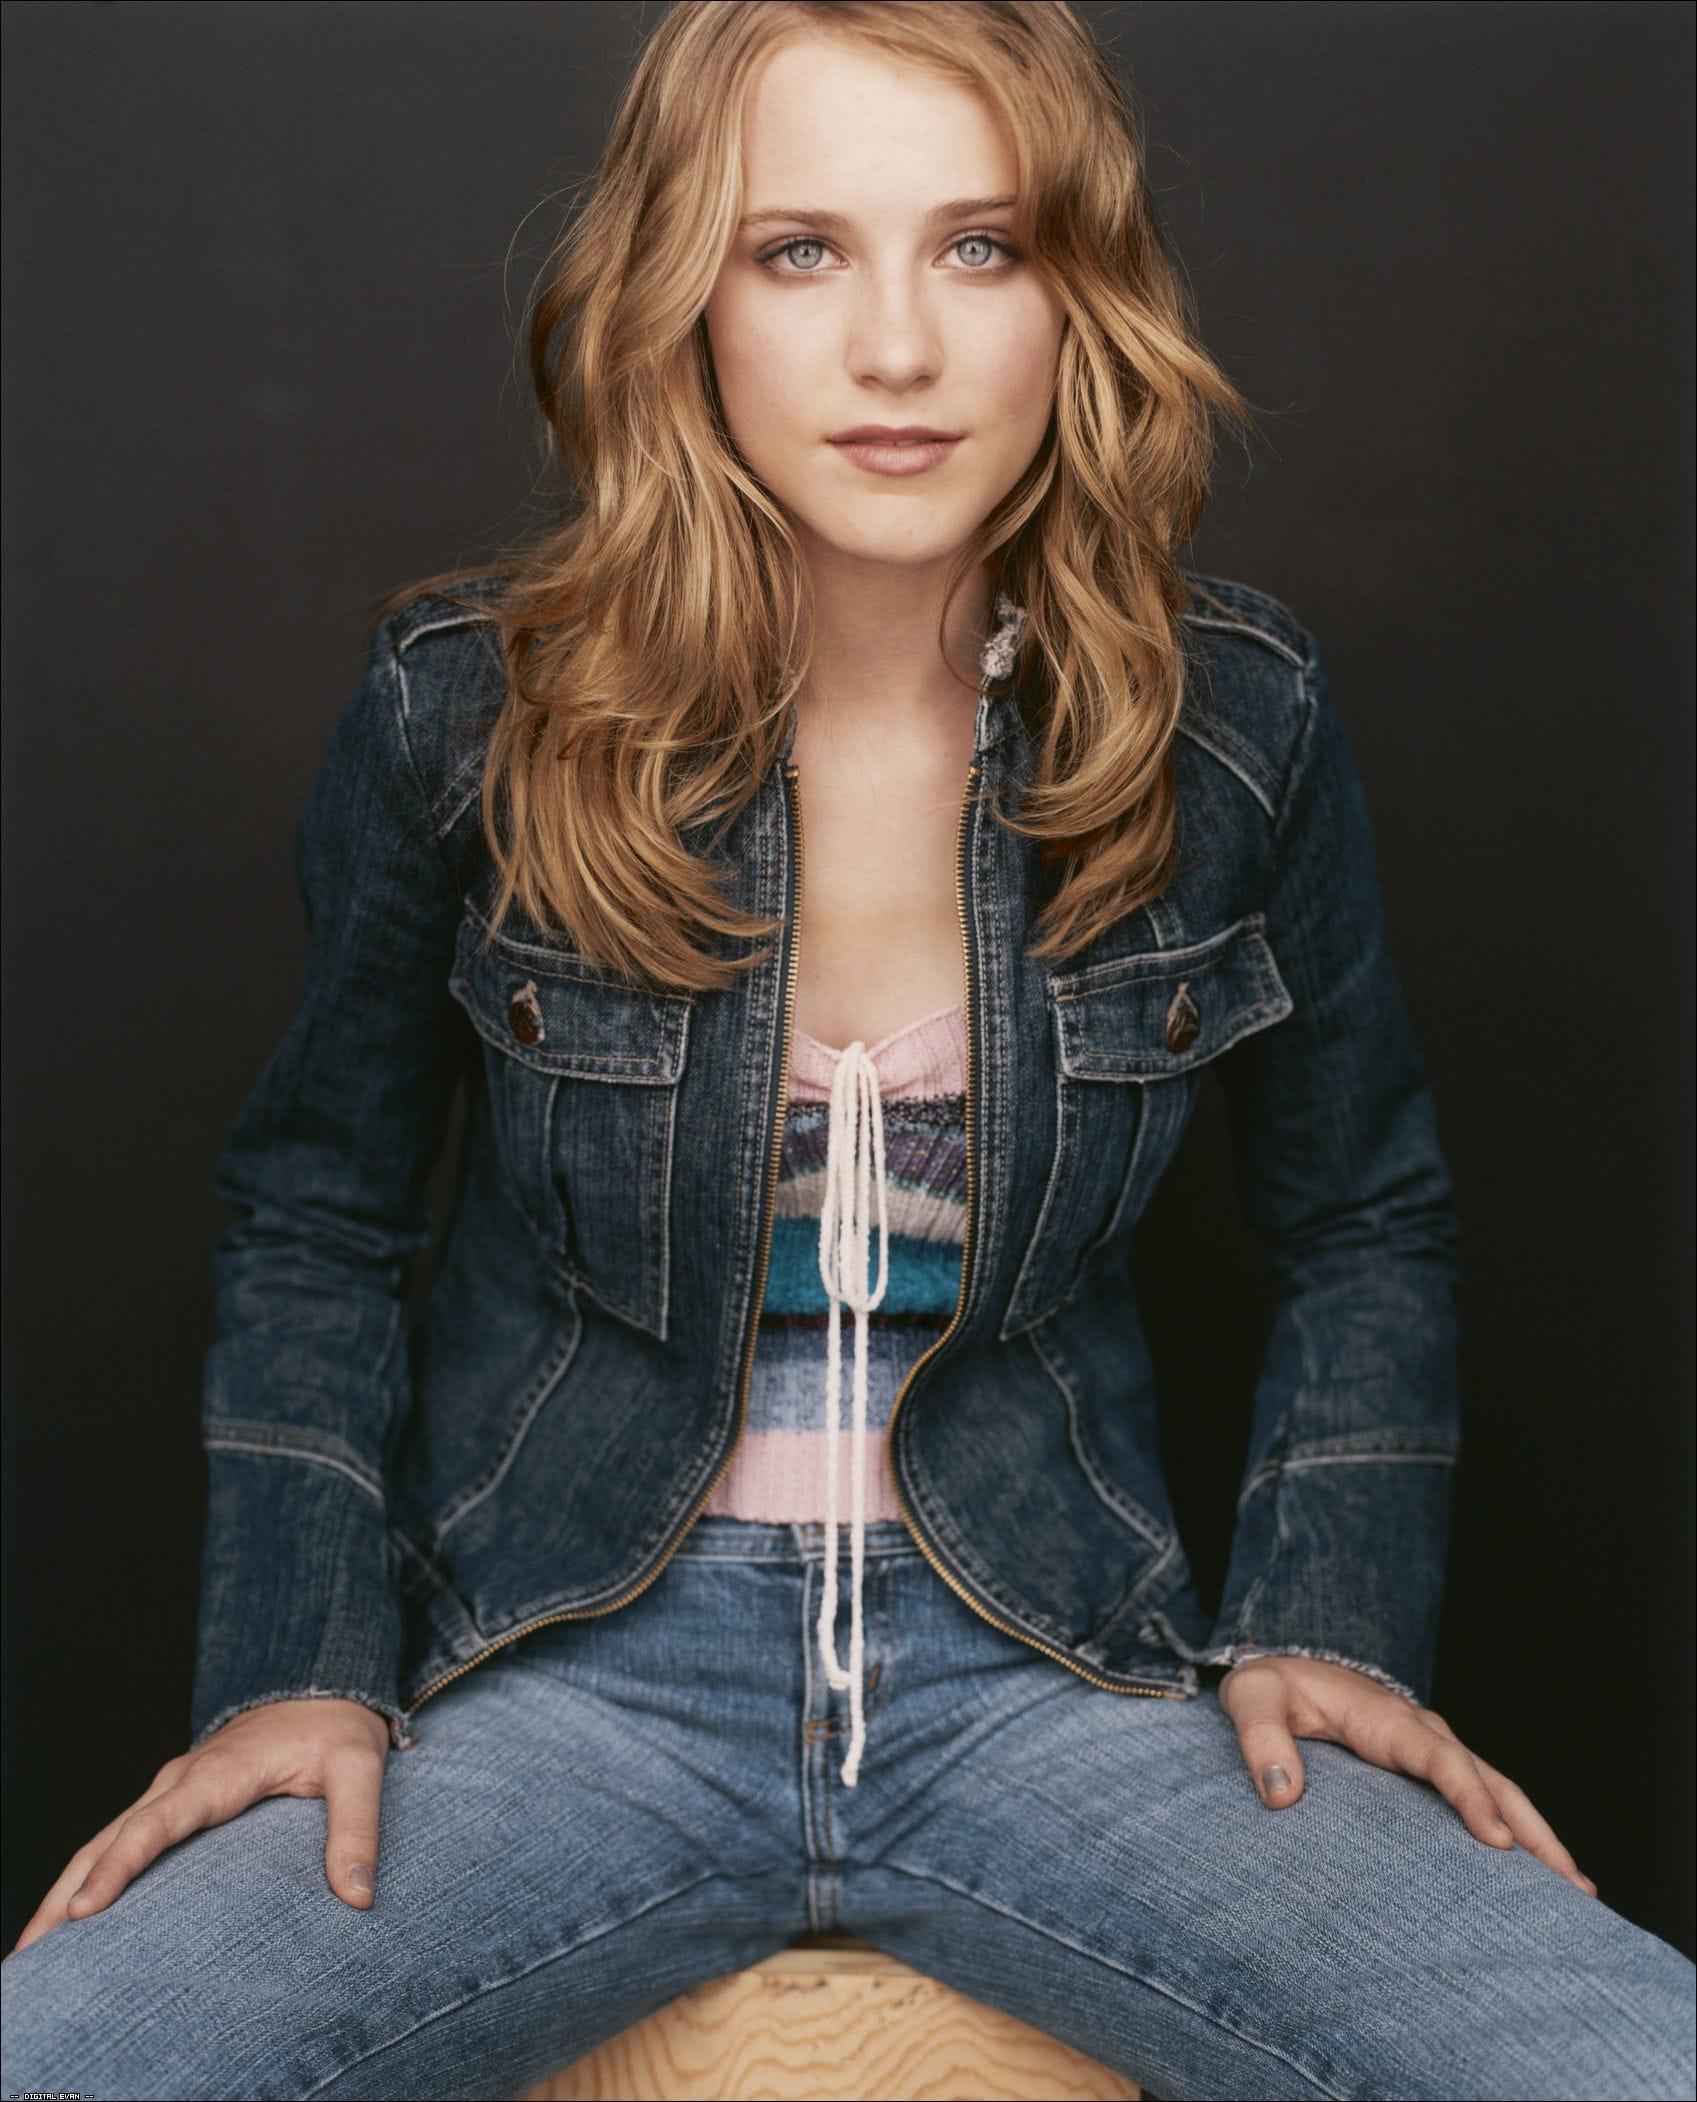 Evan Rachel Wood For mobile